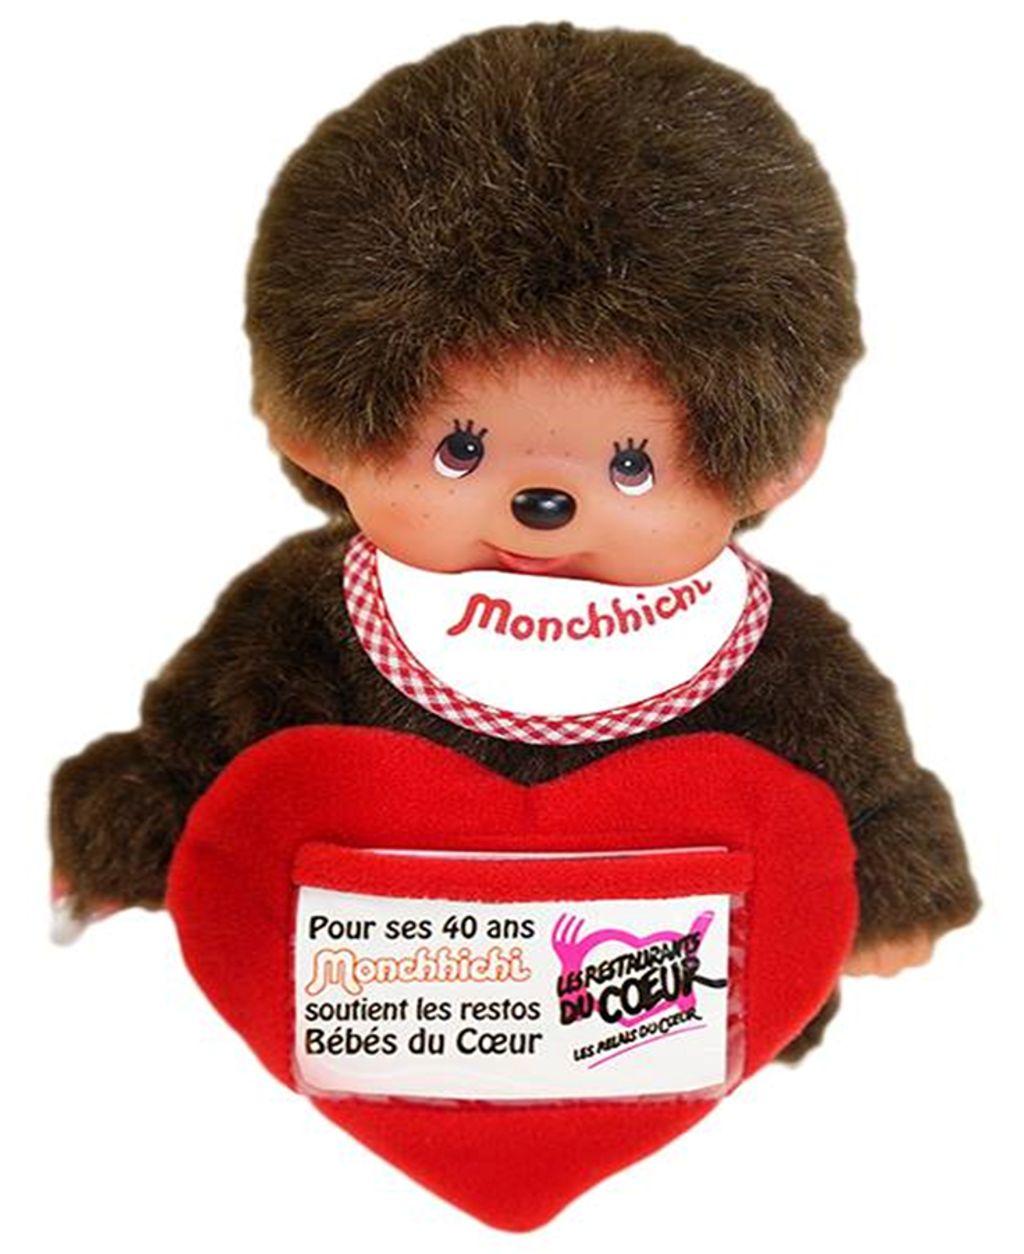 Monchhichi s'associe au Restos du Coeur